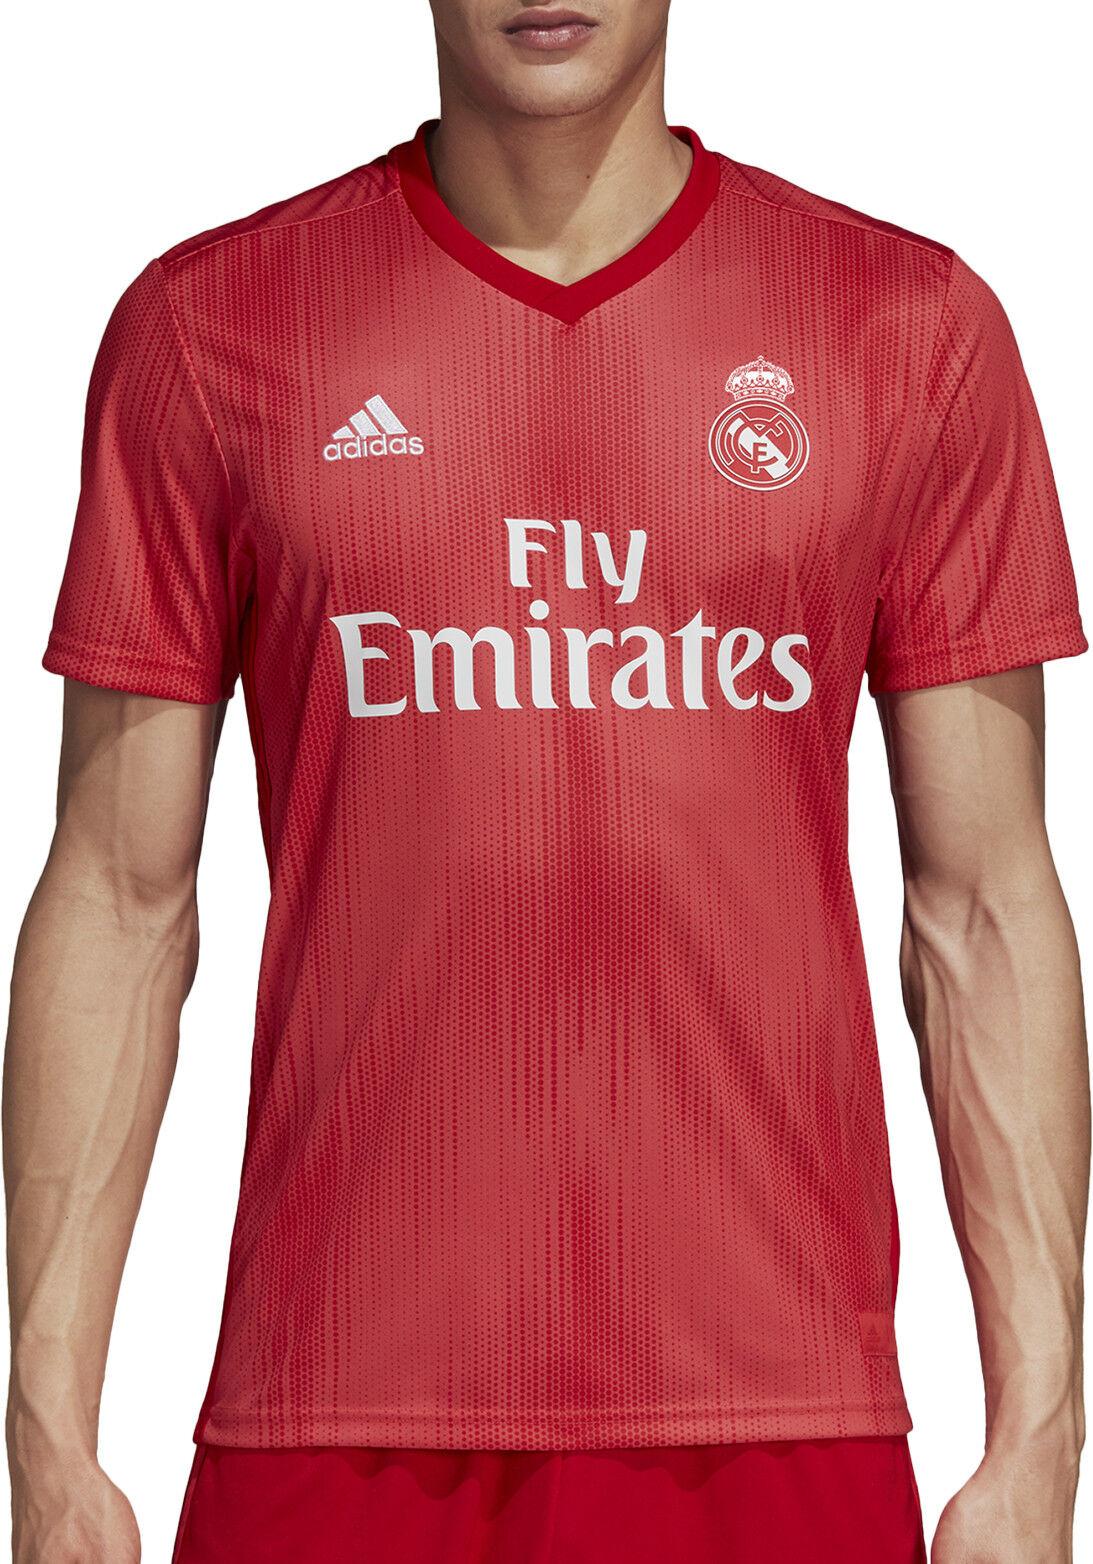 732843aff33 Adult S adidas Real Madrid Third Shirt 2018-19 Sergio Ramos 4 Badges ...